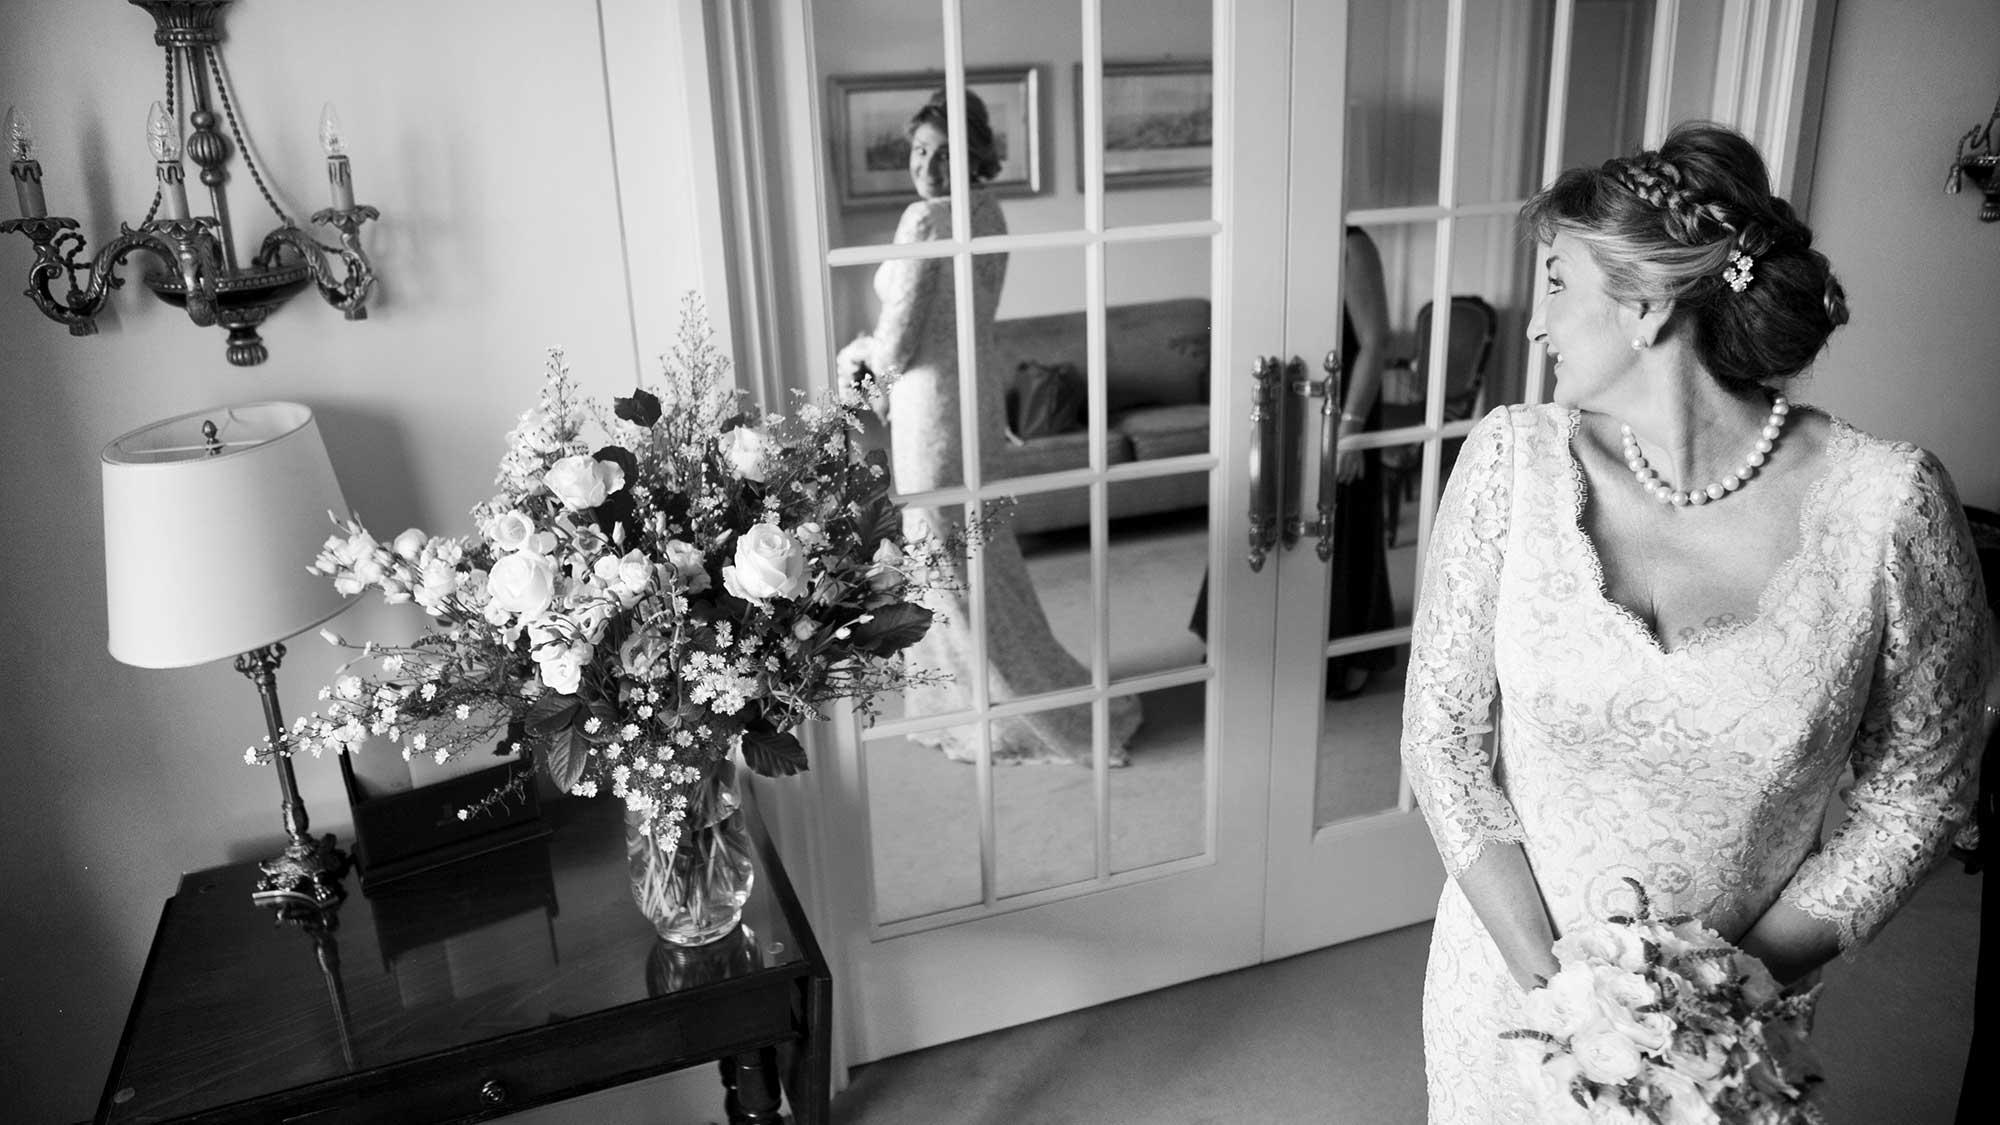 villadeste_wedding_photographers_005